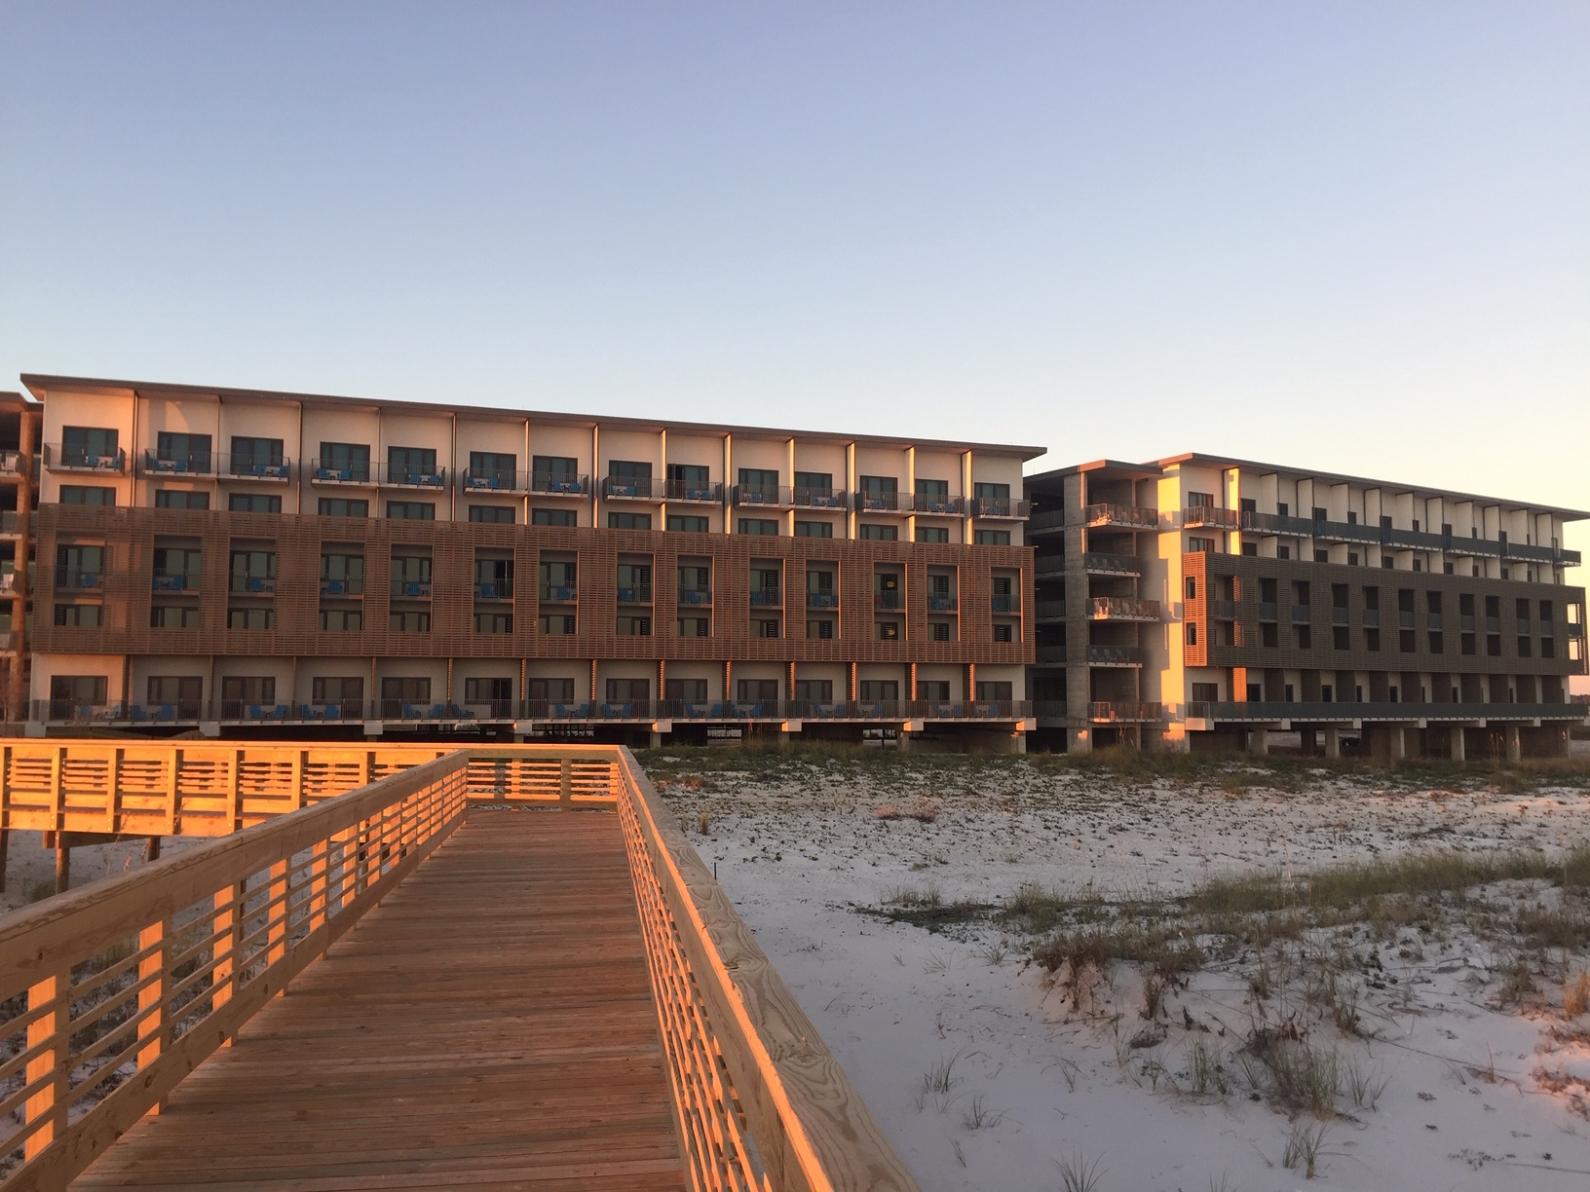 The Lodge is a Hilton Hotel.